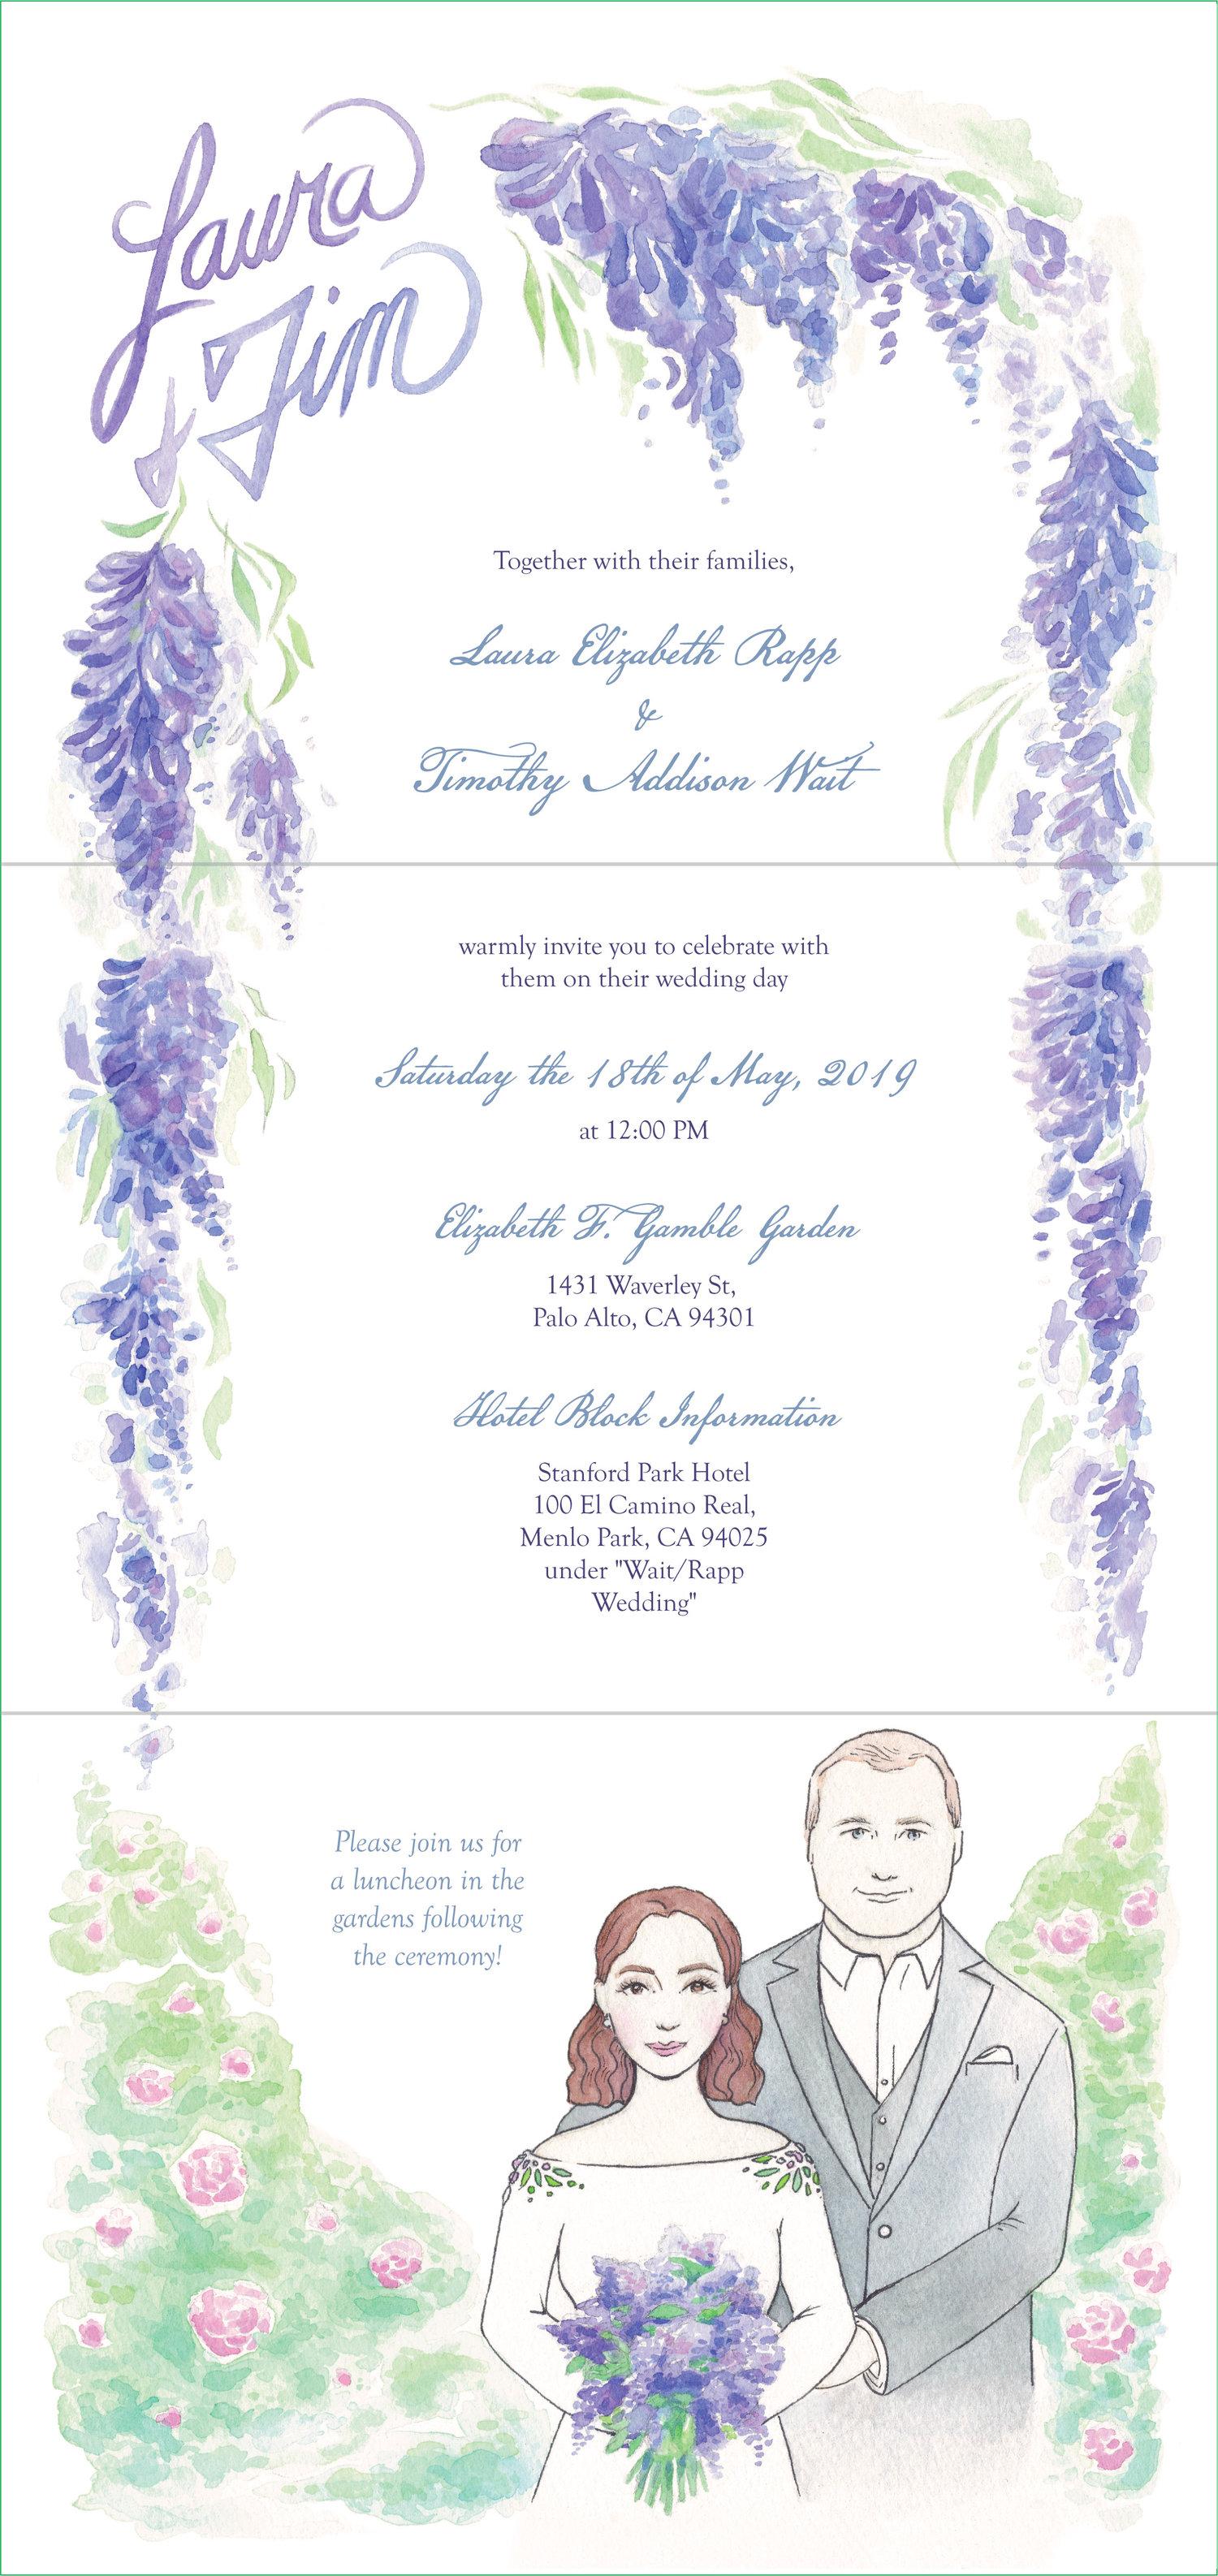 Botanical-wedding-invitation-custom-watercolor-art-garden-invite-luminous-creative-studio.jpg